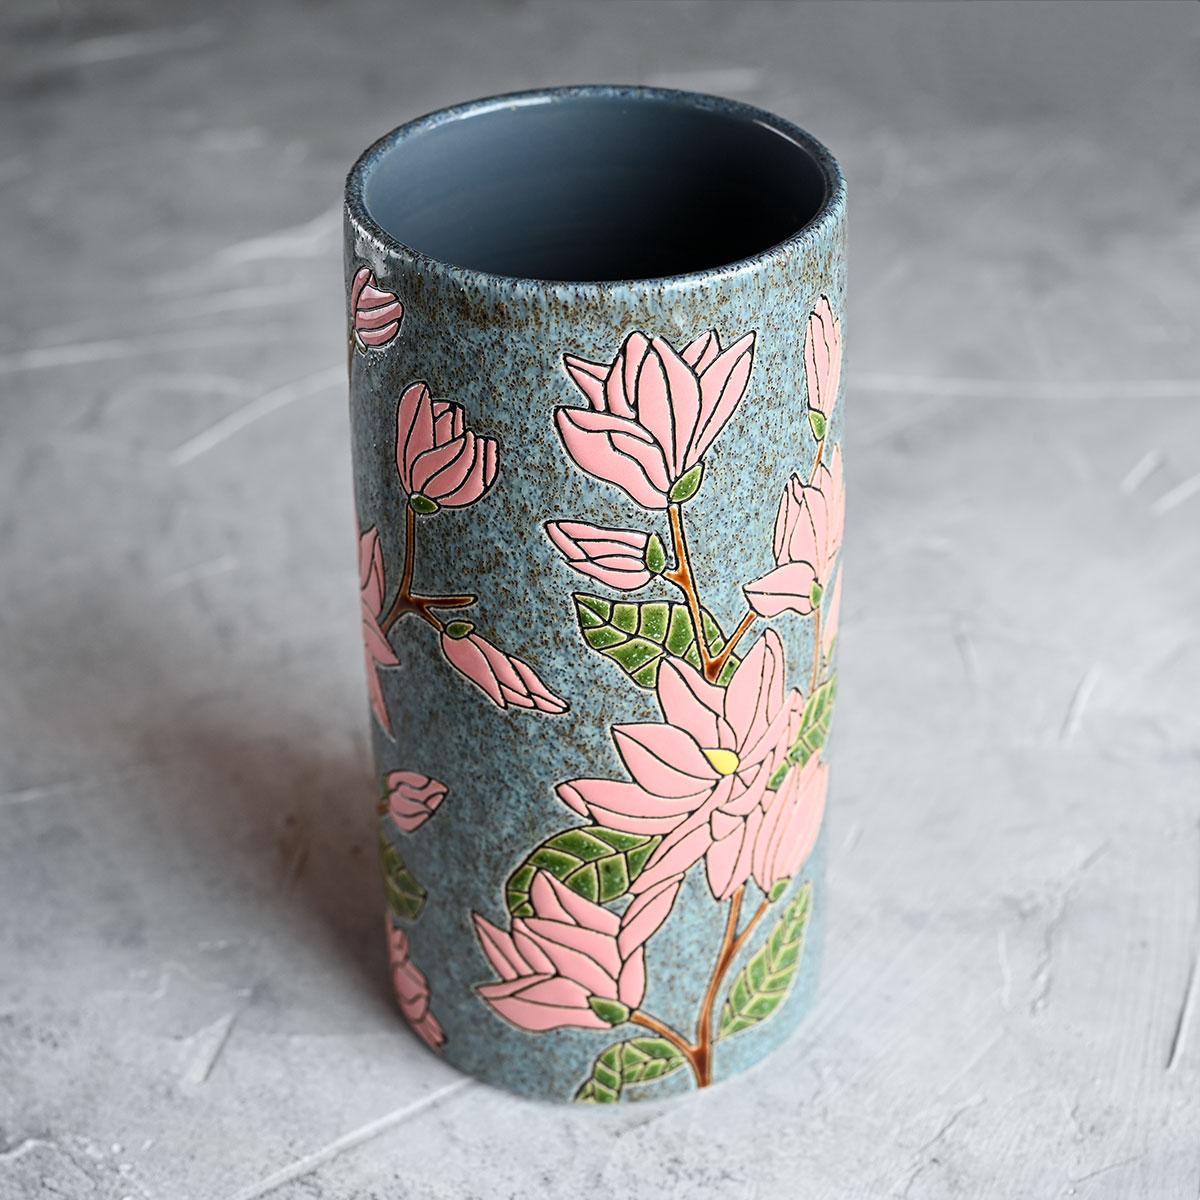 картинка Высокая ваза с магнолиями - DishWishes.Ru